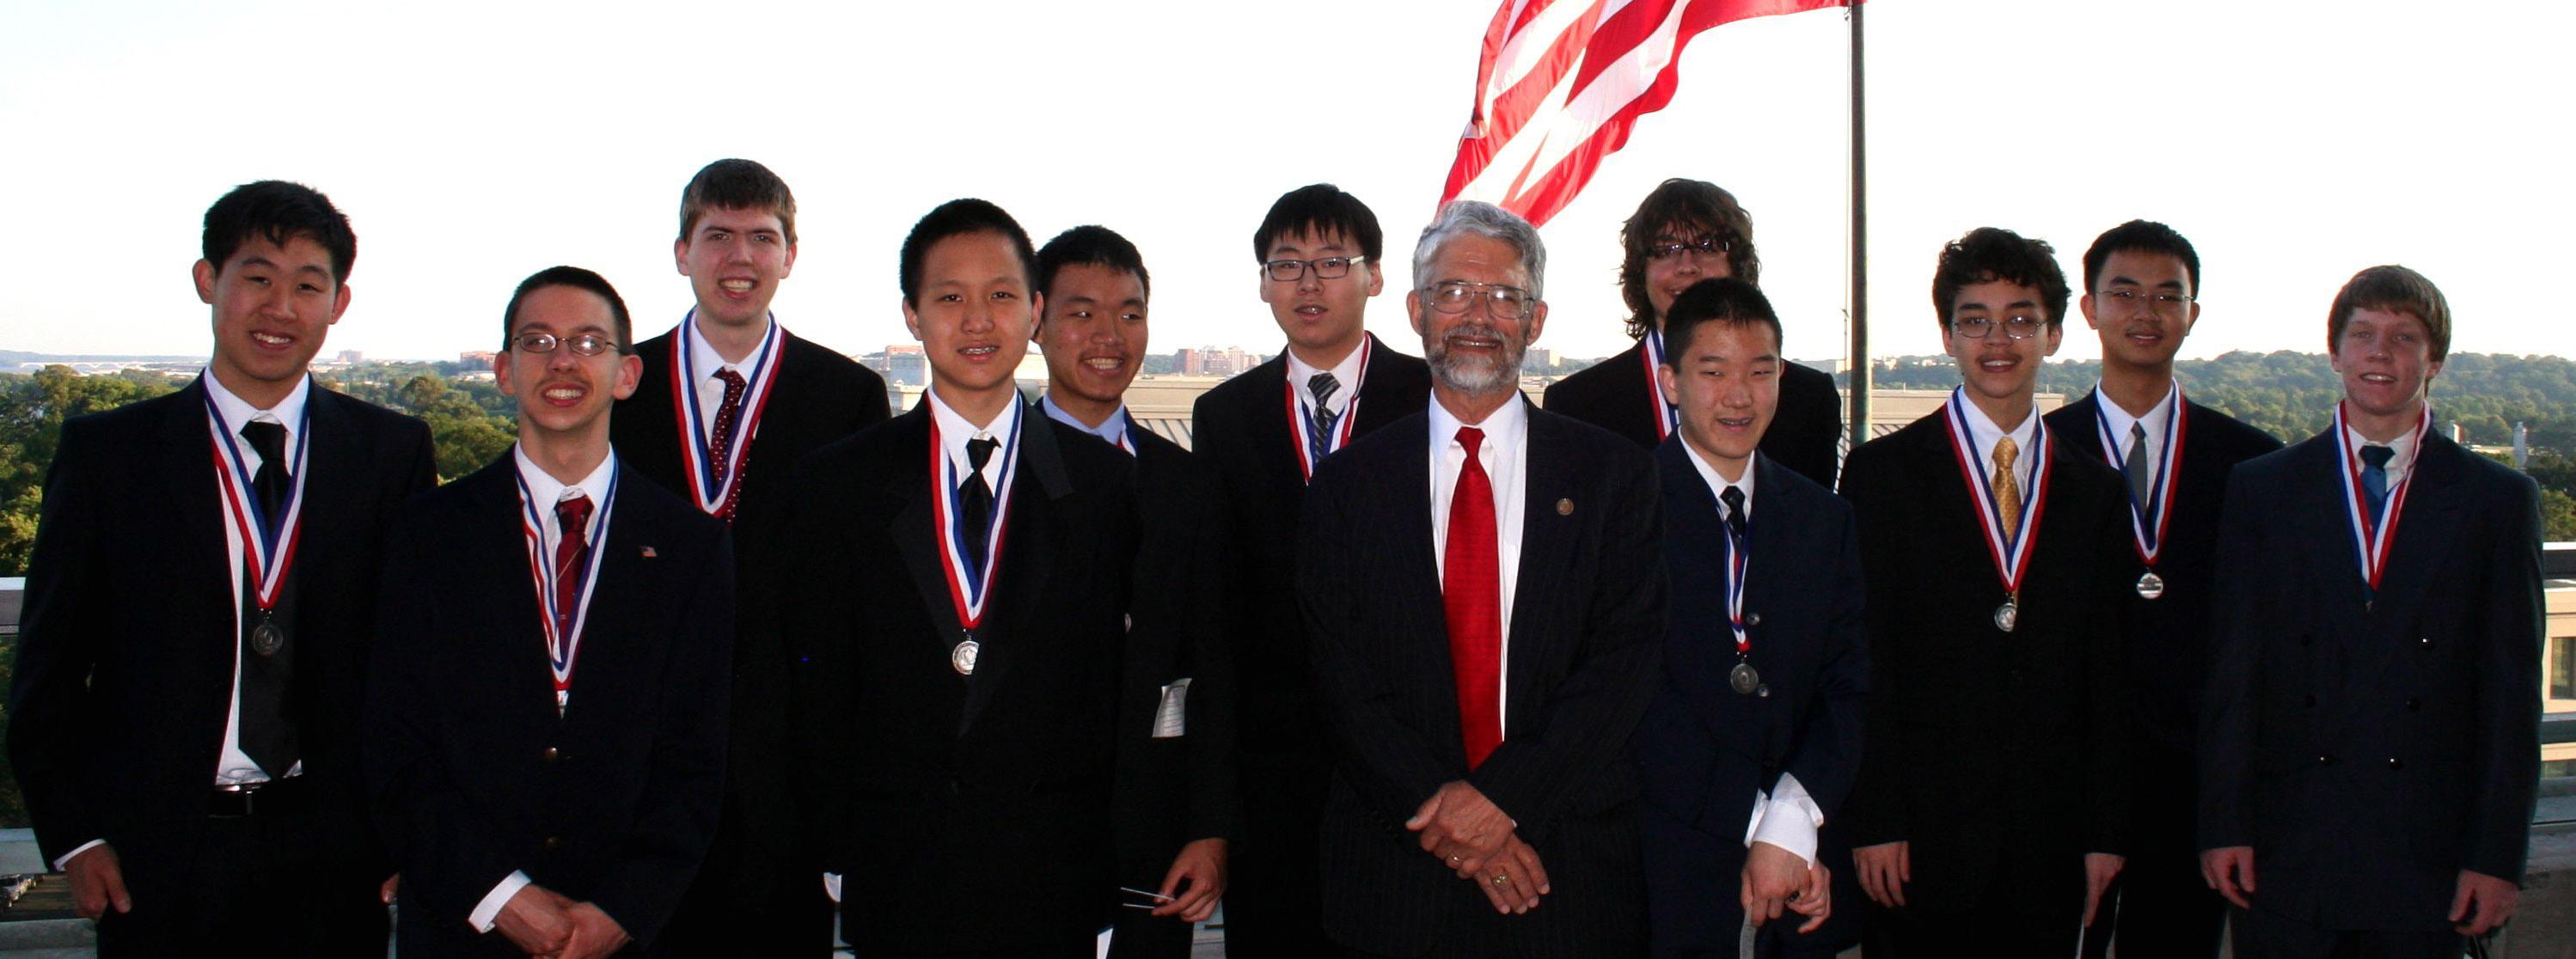 2010 High School Mathematics Olympians Honored in Washington